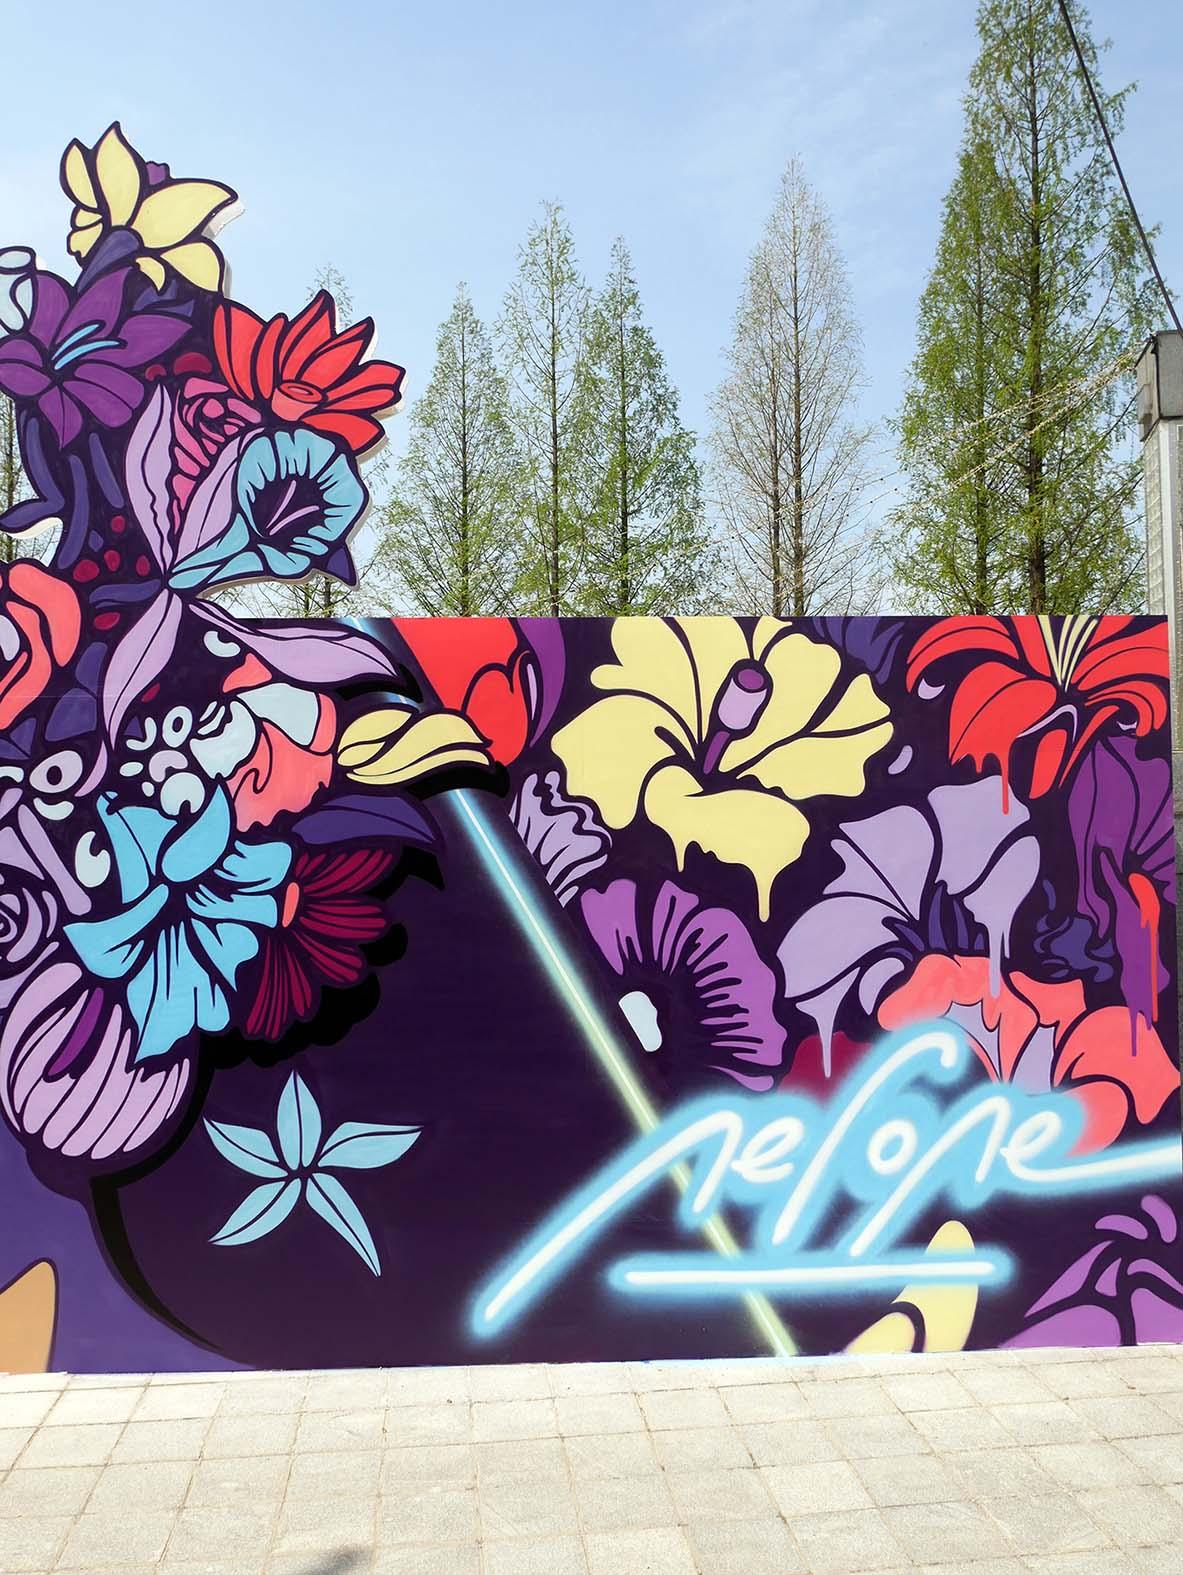 Nerone-street-art-seoul-korea 4